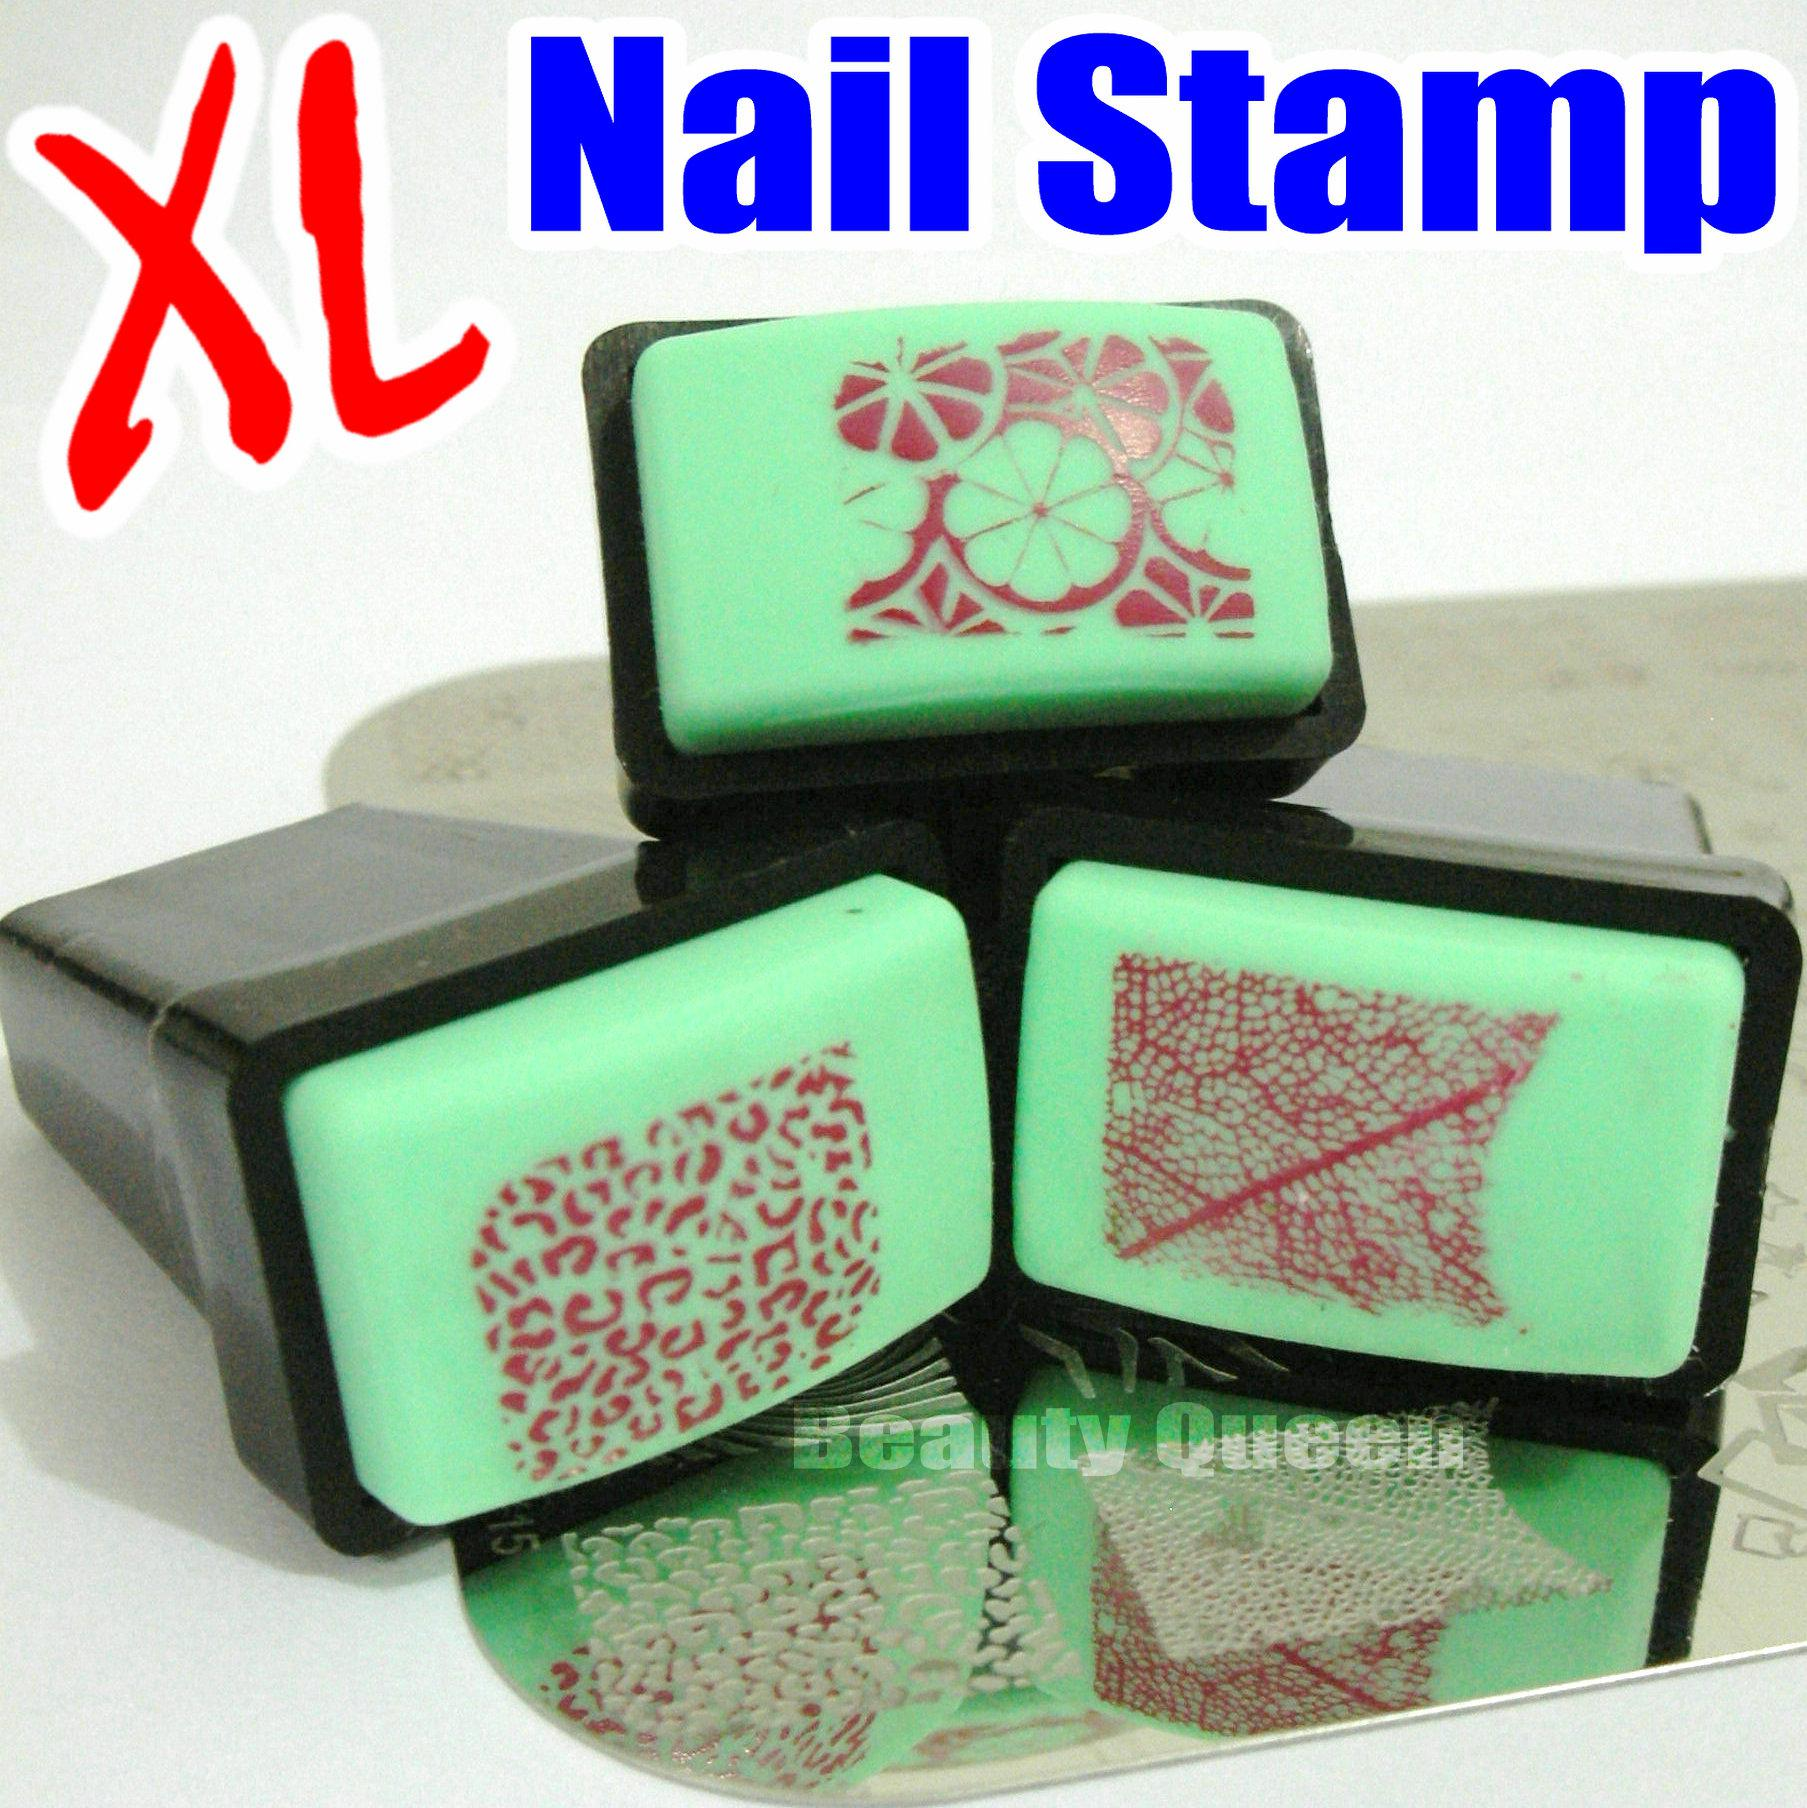 New Xl Square Nail Stamp Amp Scraper Rectengular Rubber Stamper